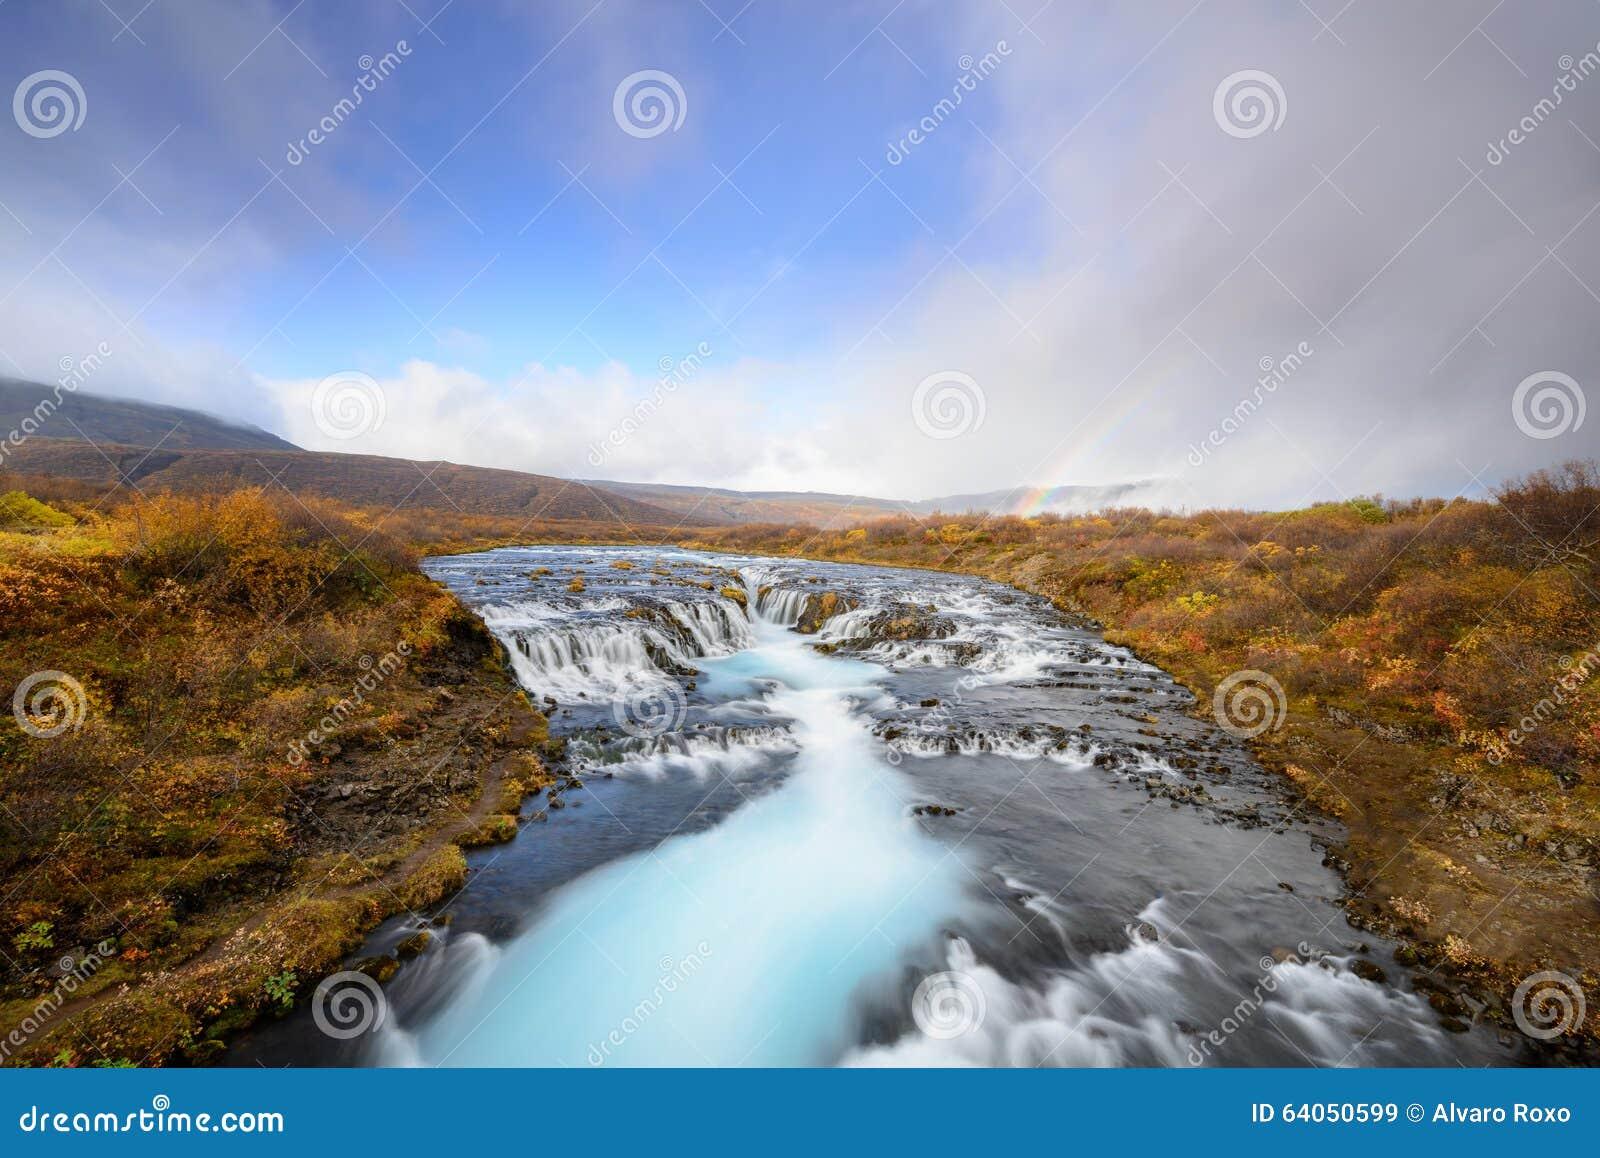 Bruarfoss en Islandia, el misterio de la cascada azul